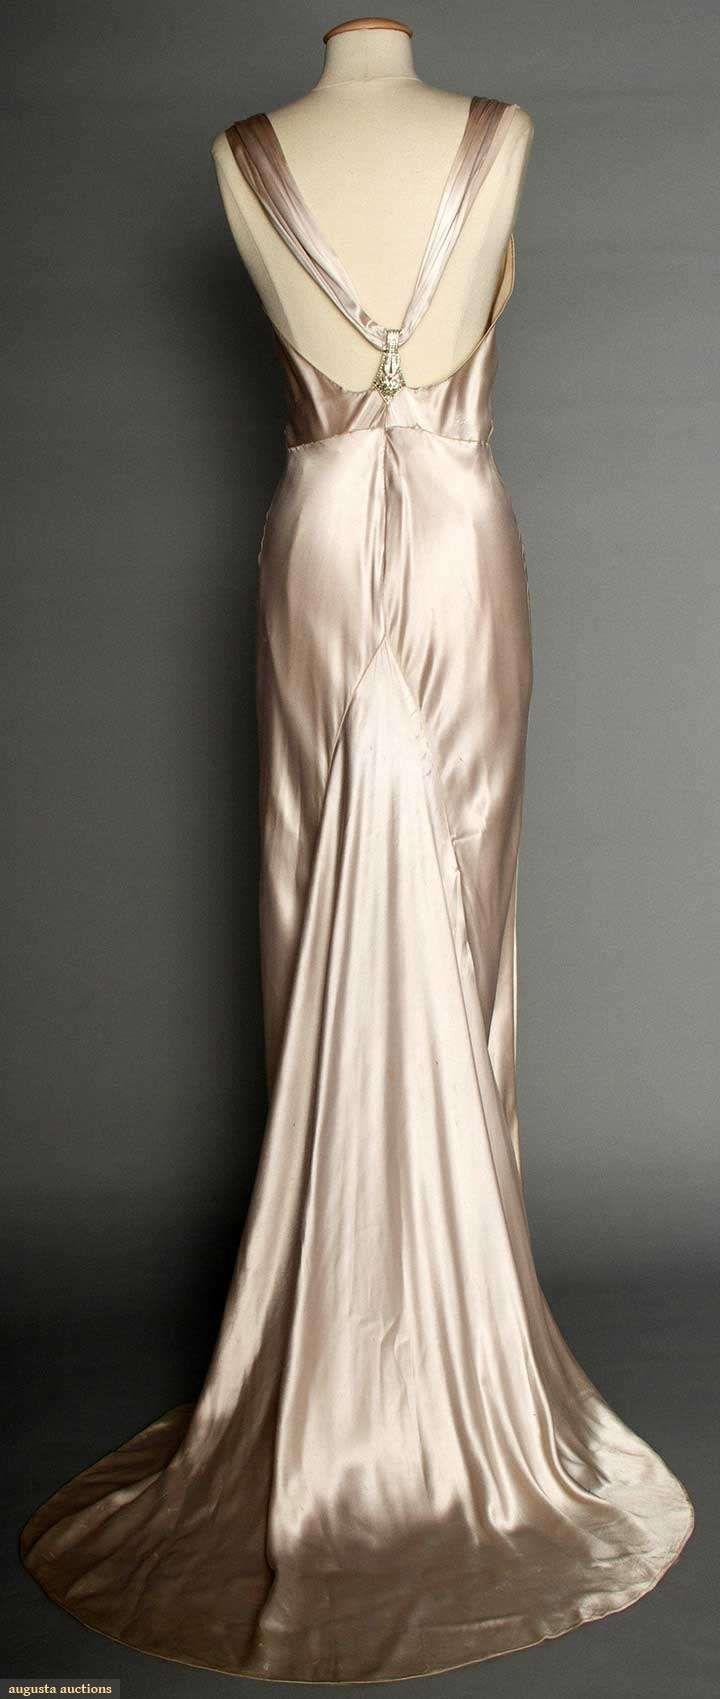 4-fashion-prom-dresses | fashion style like